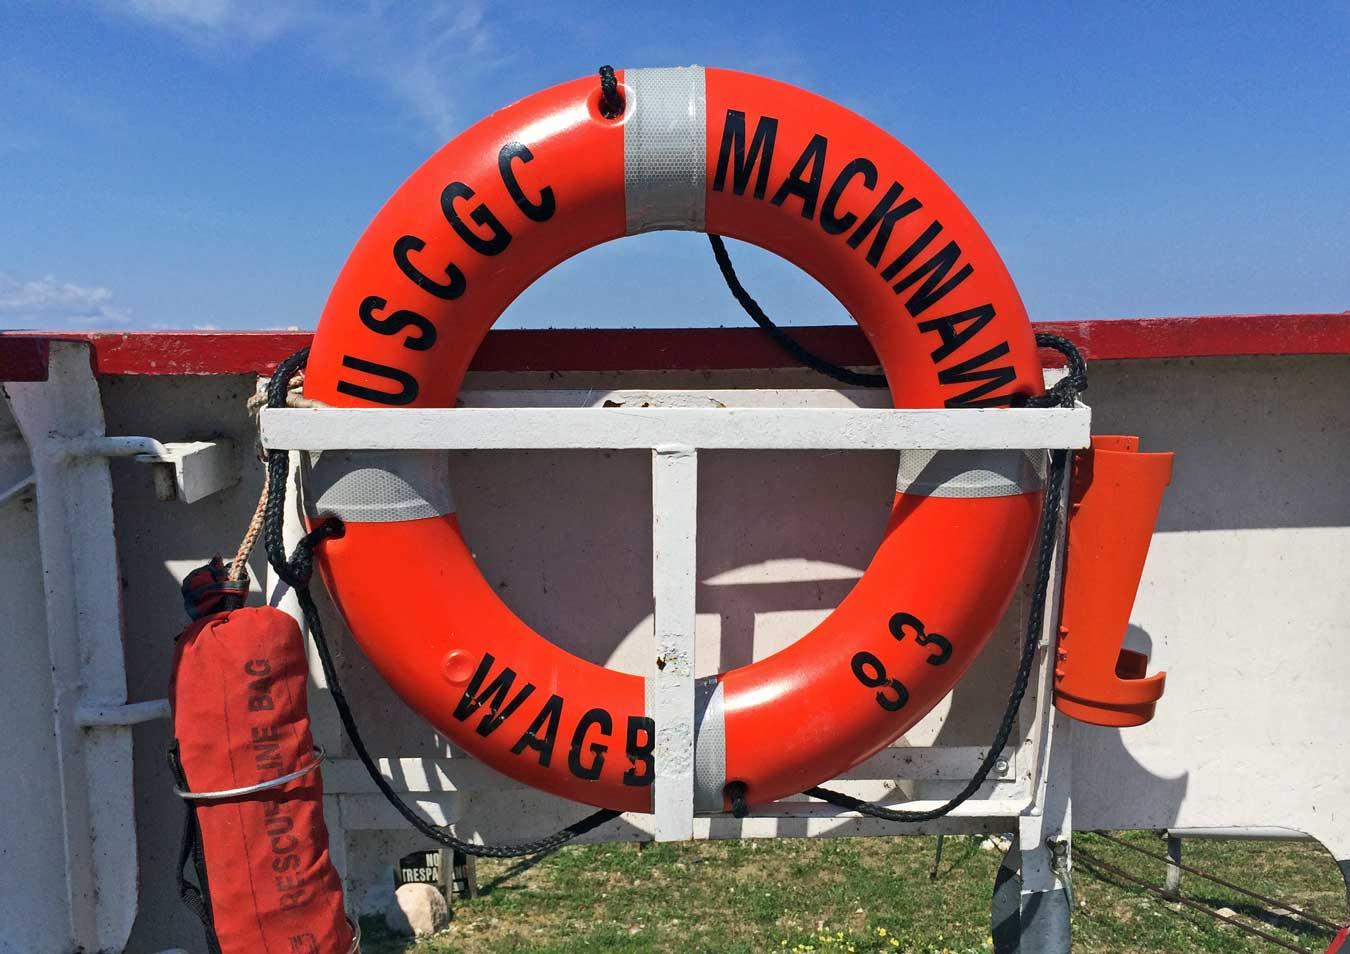 Northern Michigan Weekend: Exploring Mackinaw City